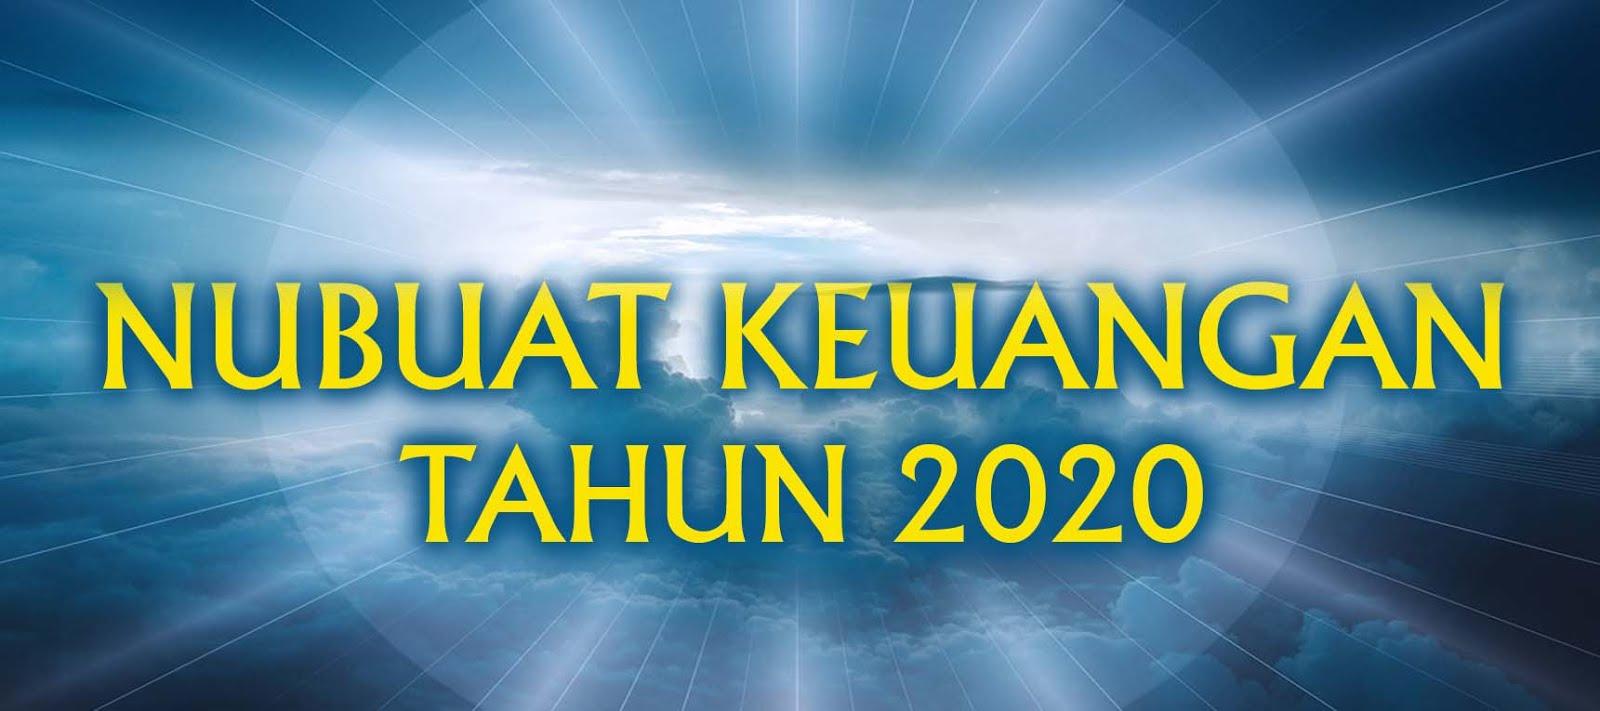 NUBUAT KEUANGAN 2020